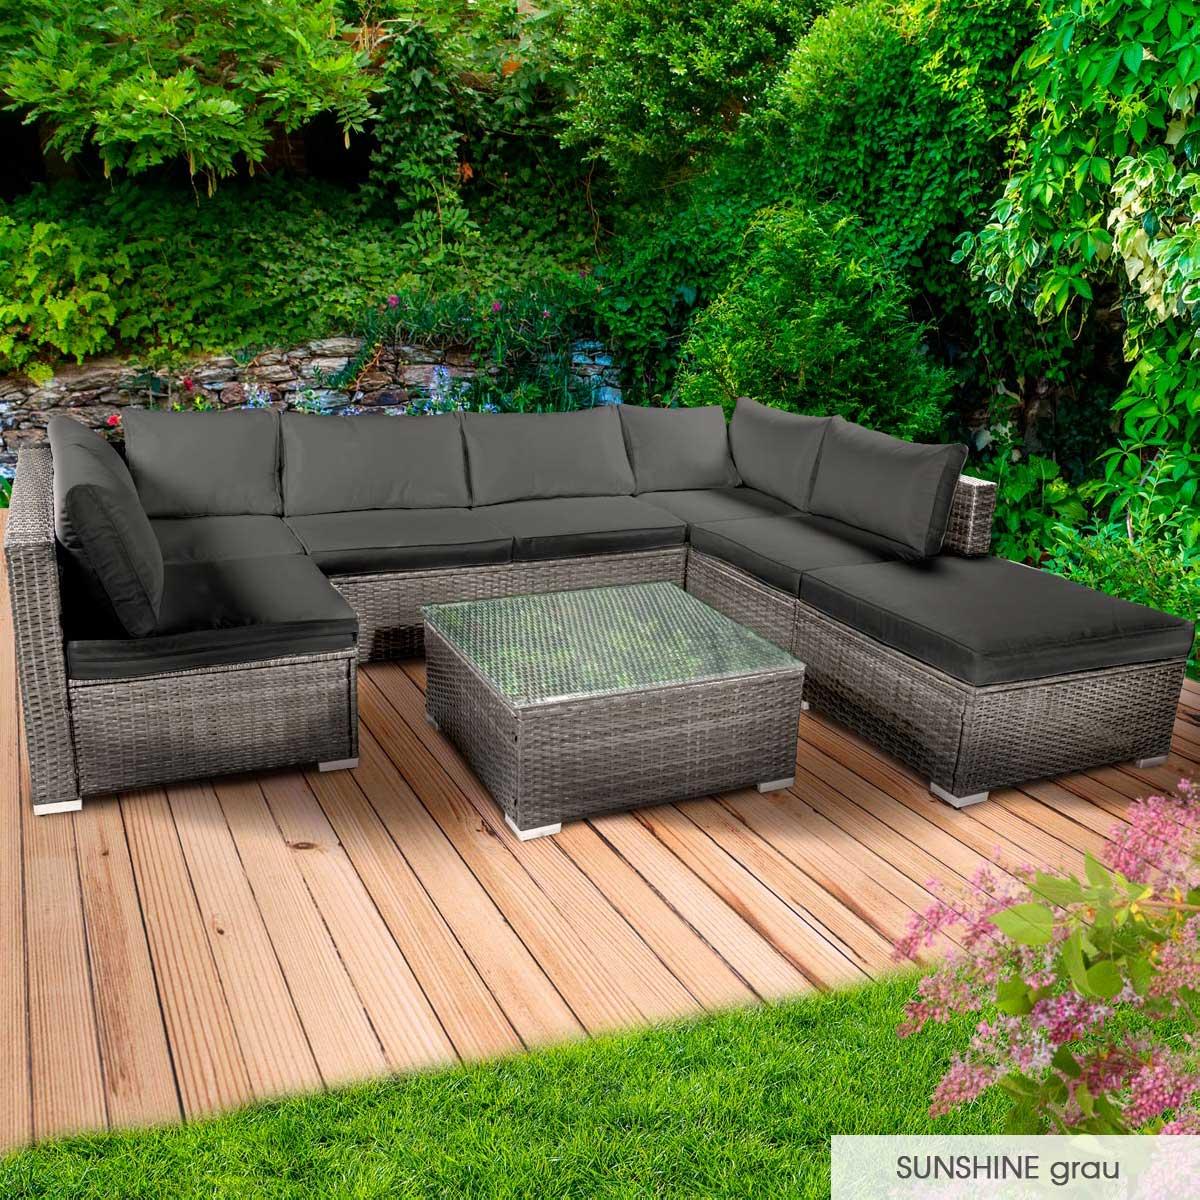 Gartenmoebel-Poly-Rattan-Lounge-Moebel-Sitzgarnitur-Gartengarnitur-Sitzgruppe-Sofa Indexbild 27